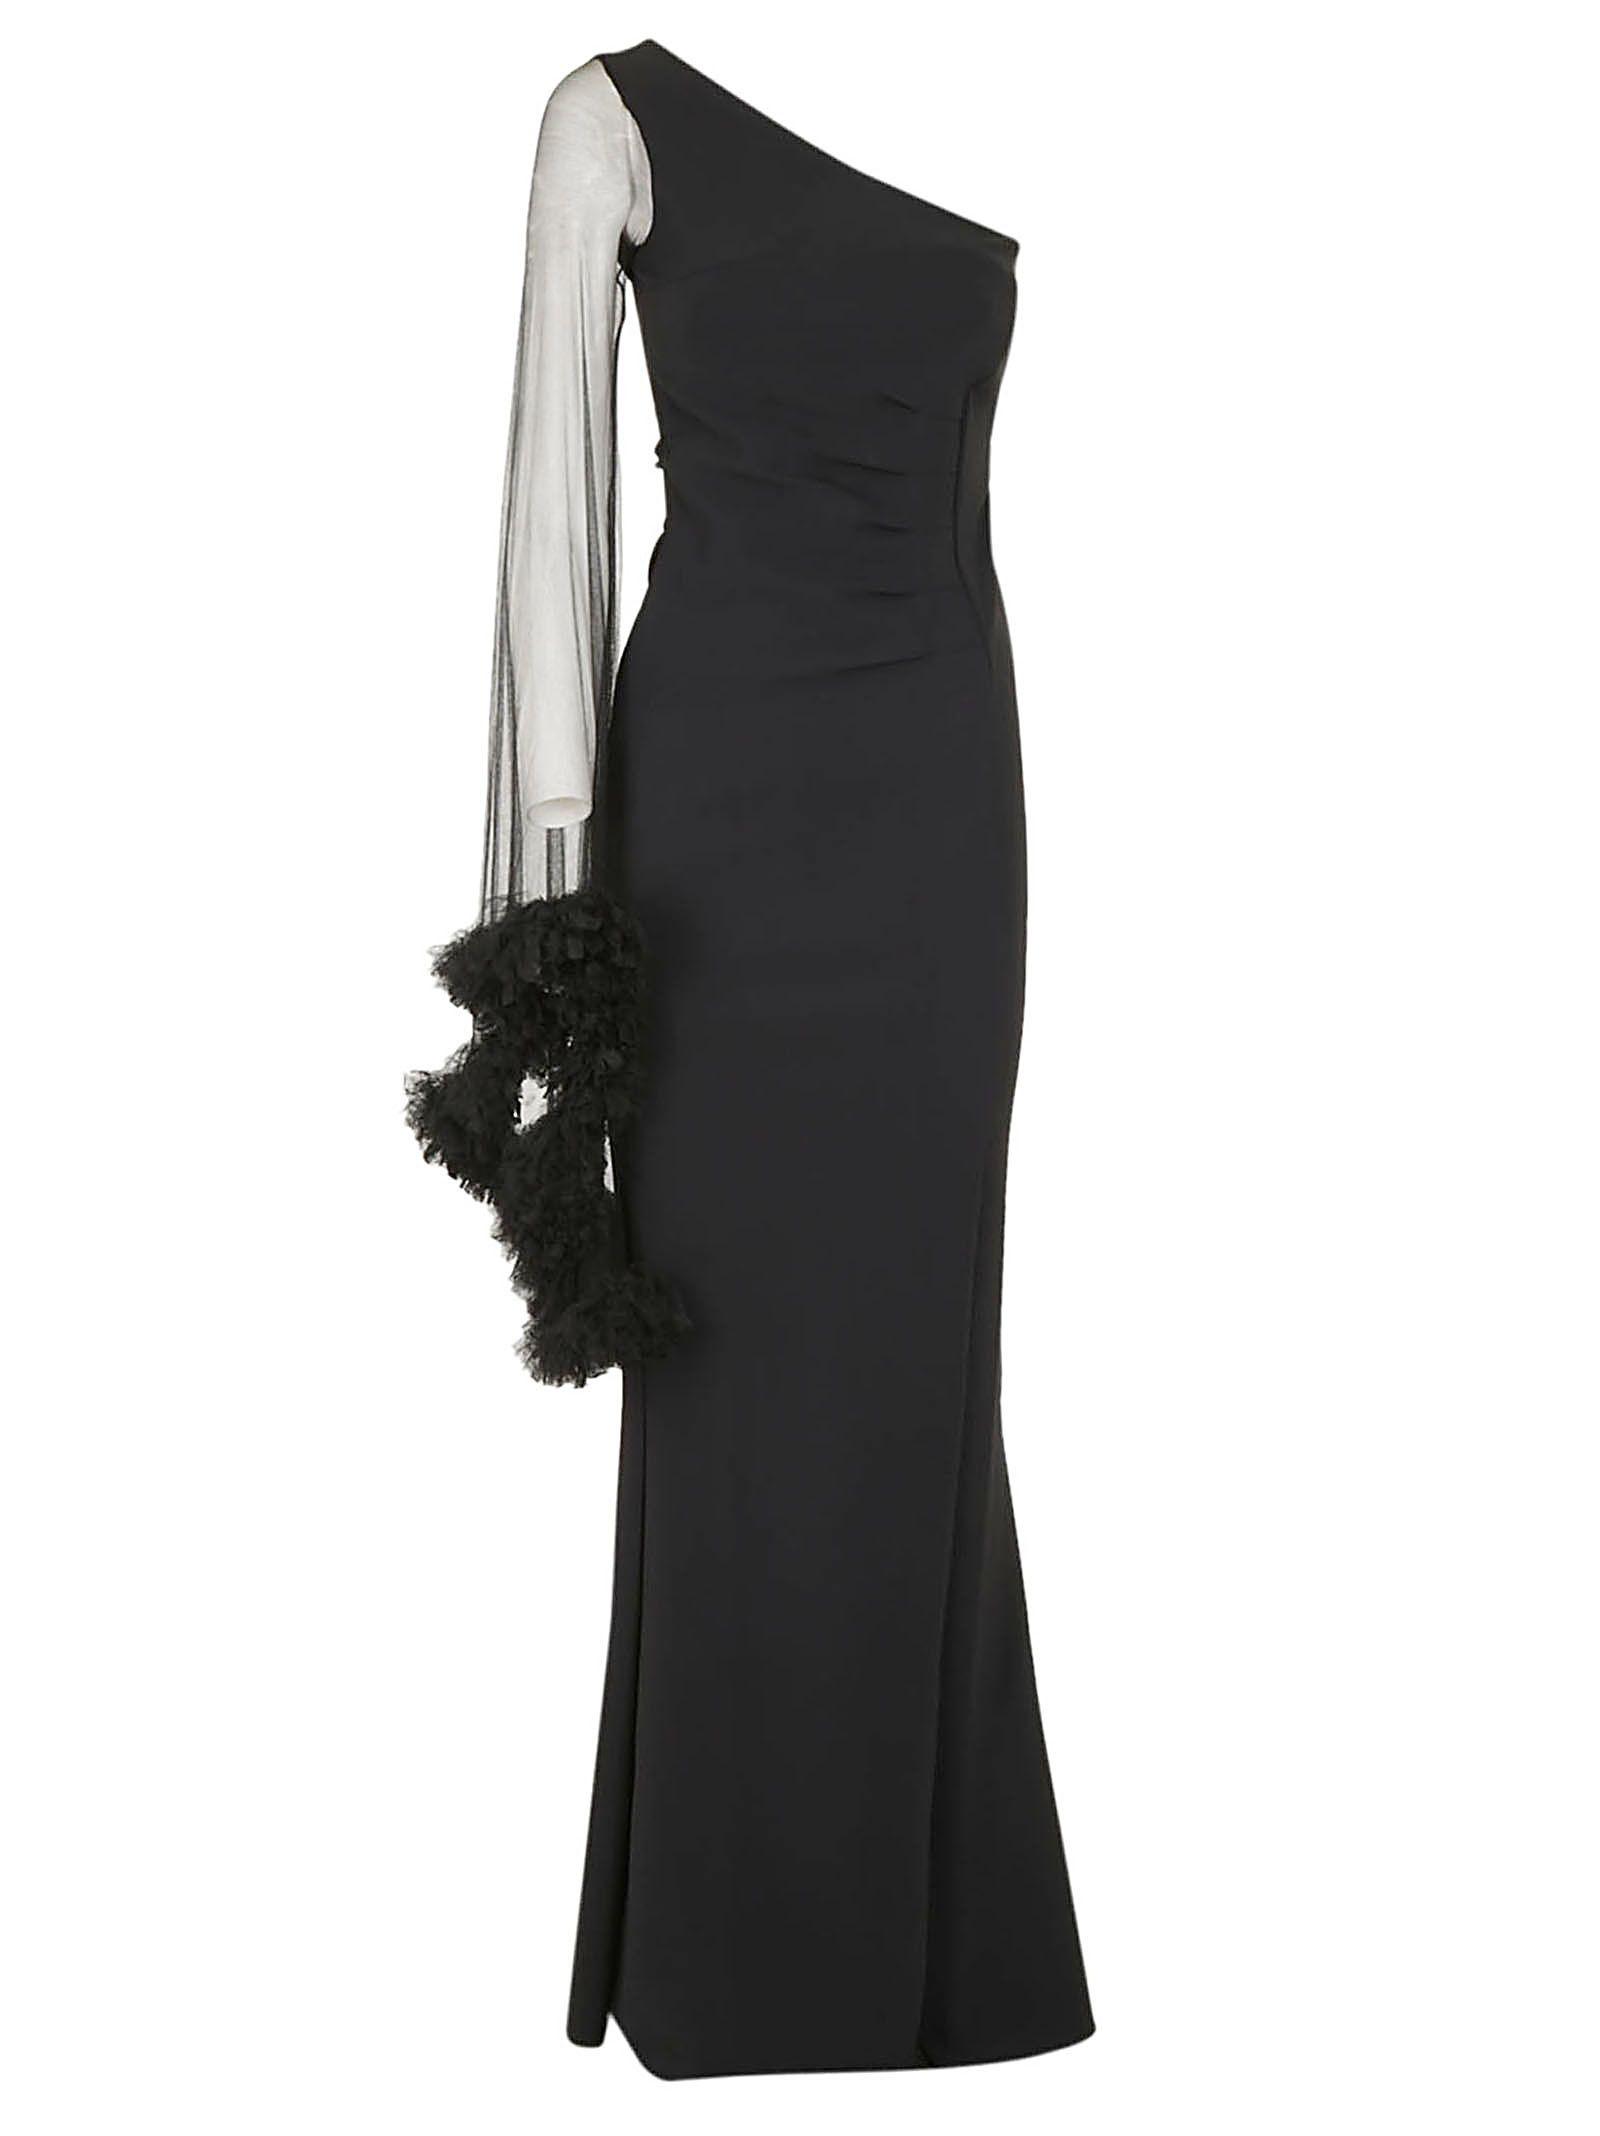 LA PETIT ROBE DI CHIARA BONI Cruz Long Dress in Black